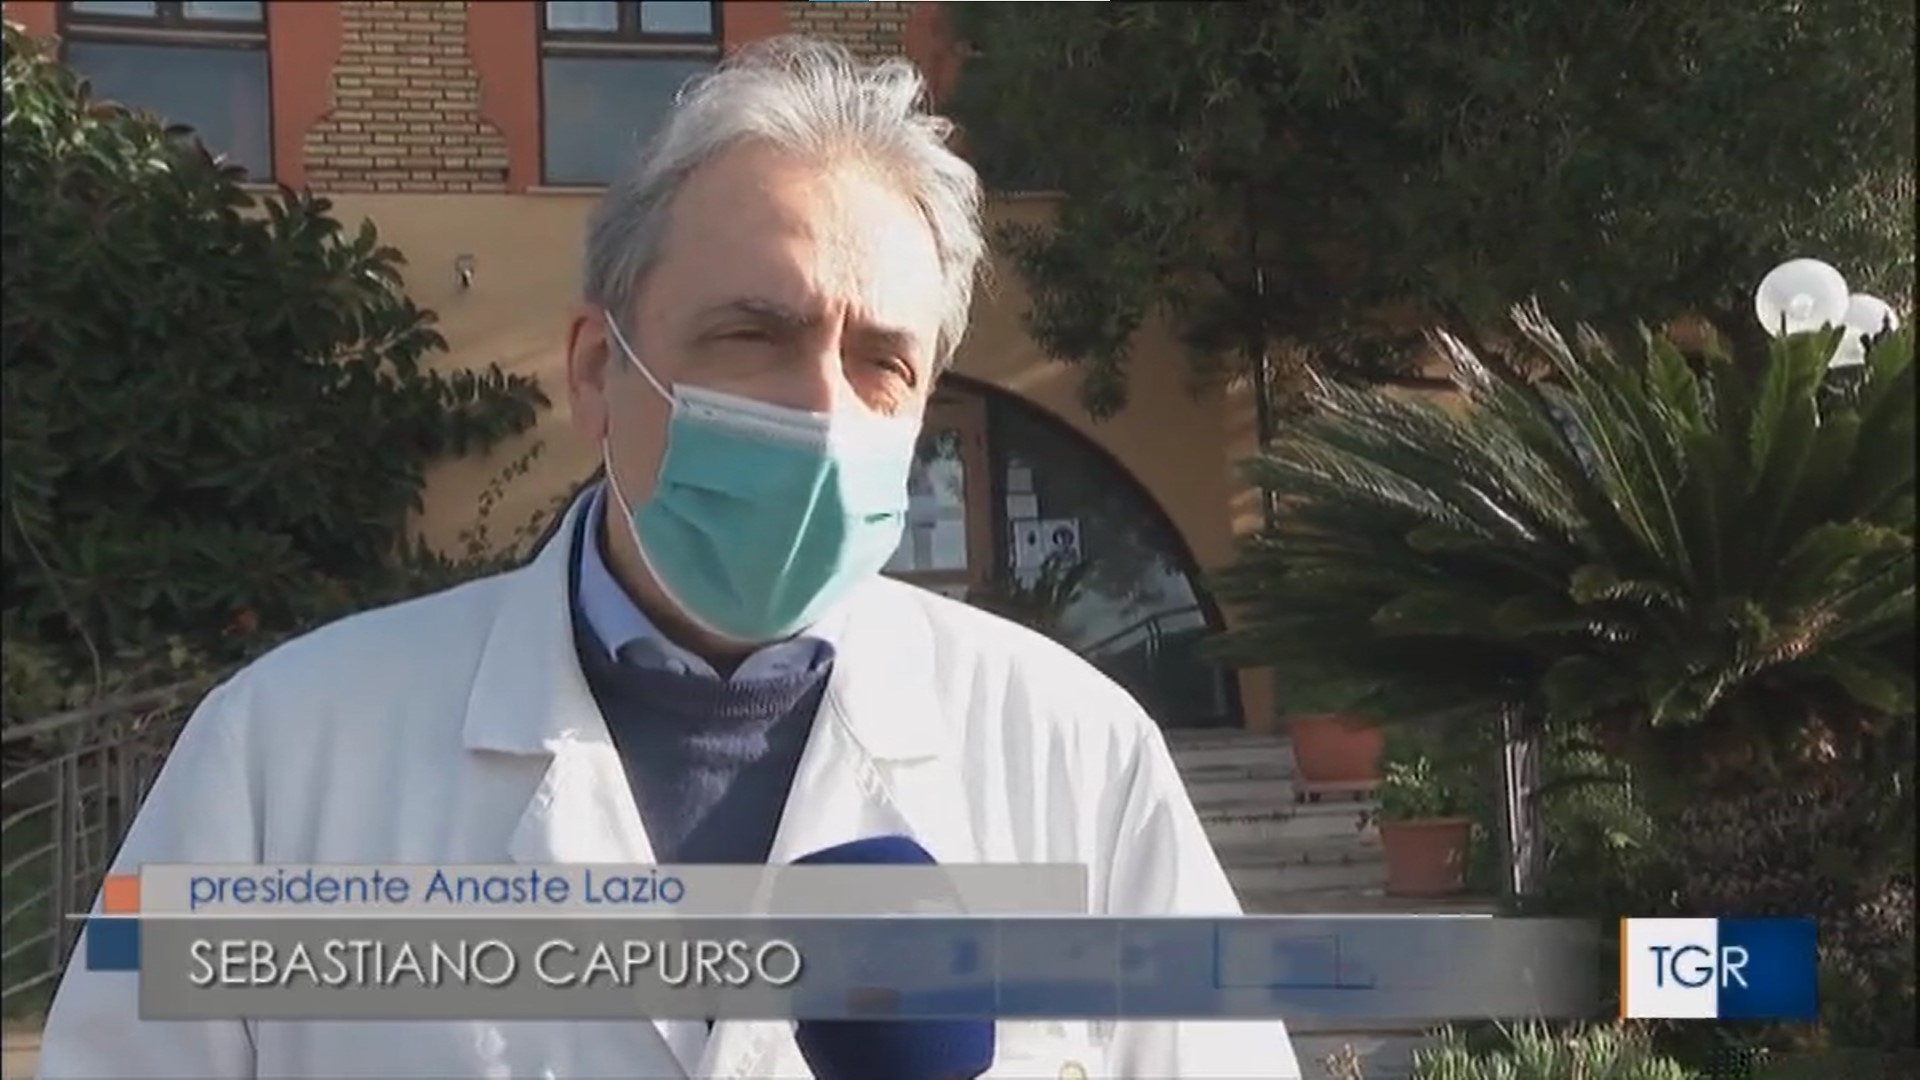 Sebastiano Capurso